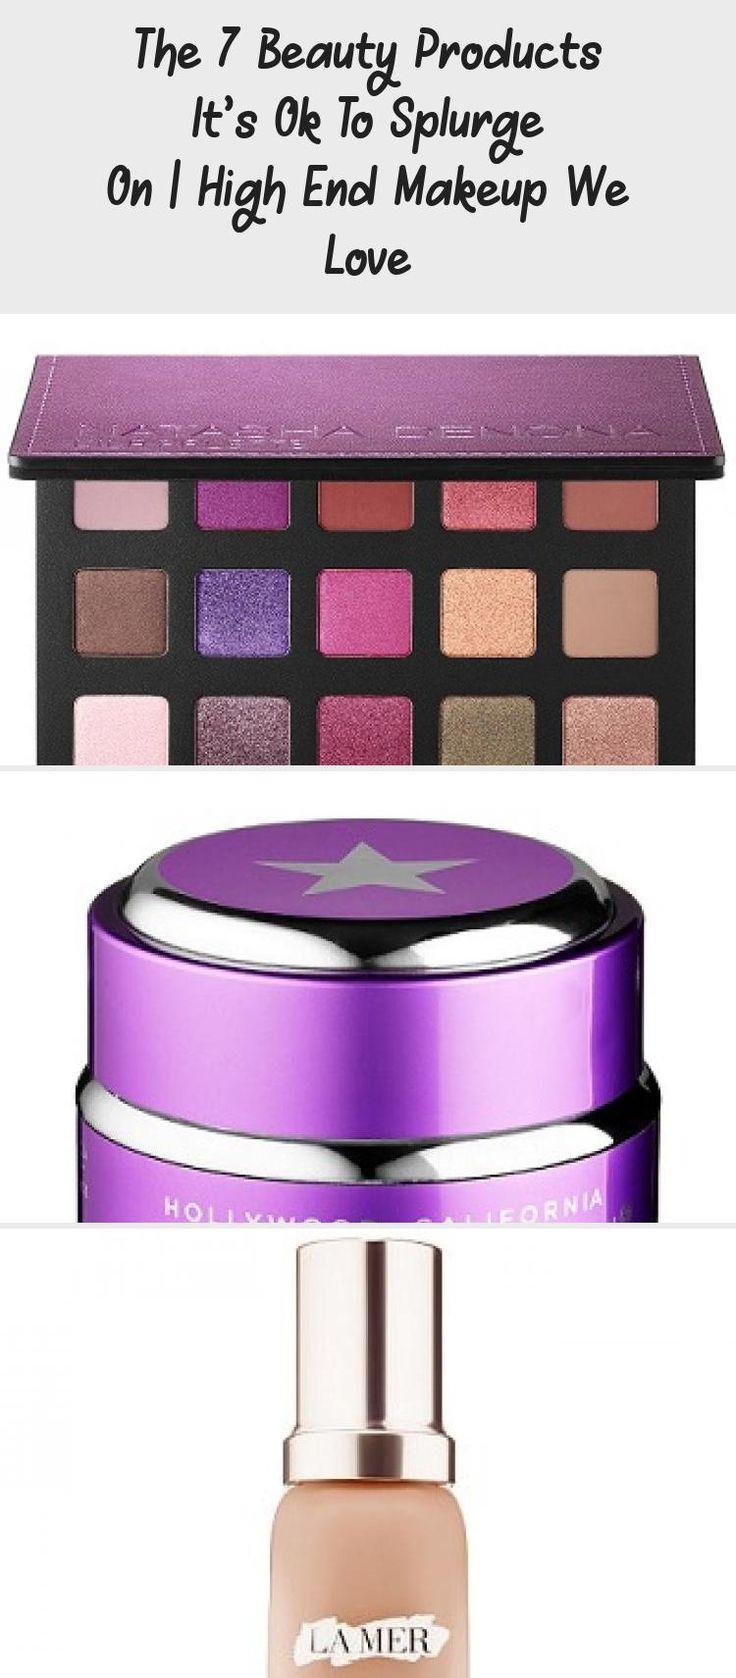 En Blog En Blog in 2020 High end makeup, Expensive